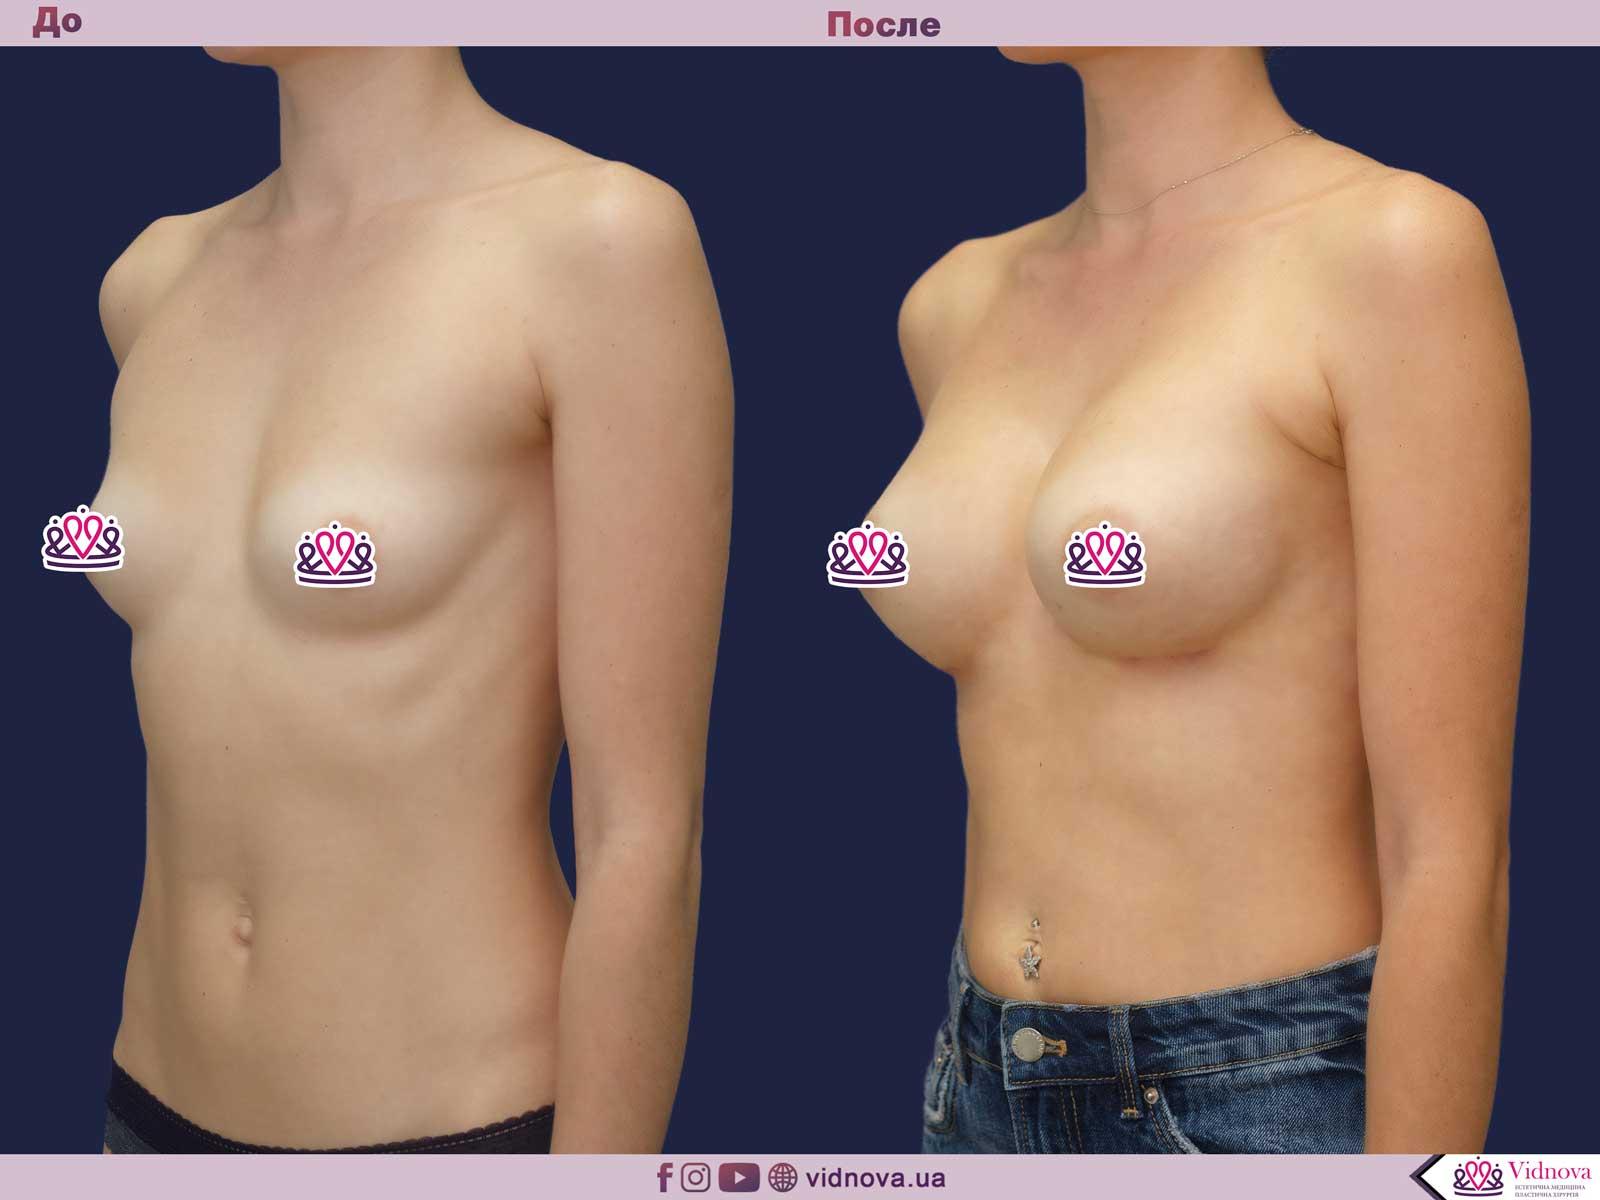 Увеличение груди: Фото ДО и ПОСЛЕ - Пример №62-2 - Клиника Vidnova